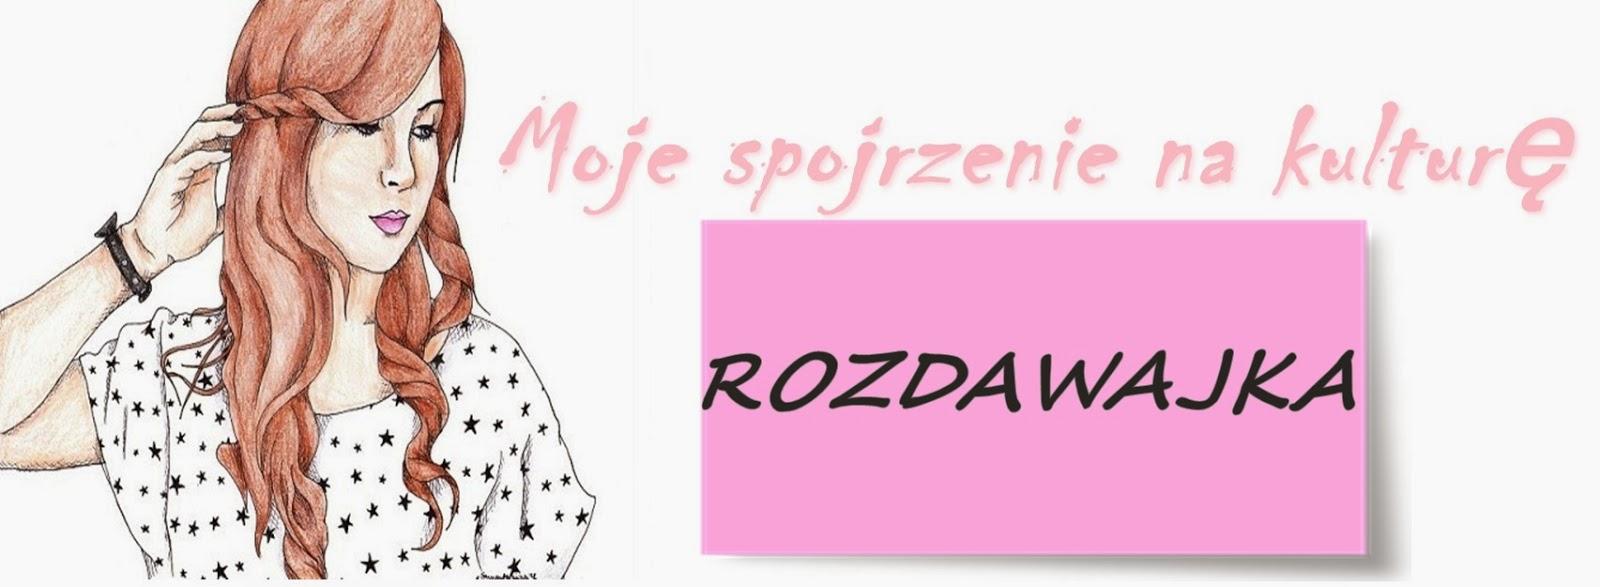 http://sylwiatylkowska.blogspot.com/2014/05/rozdawajka_4.html